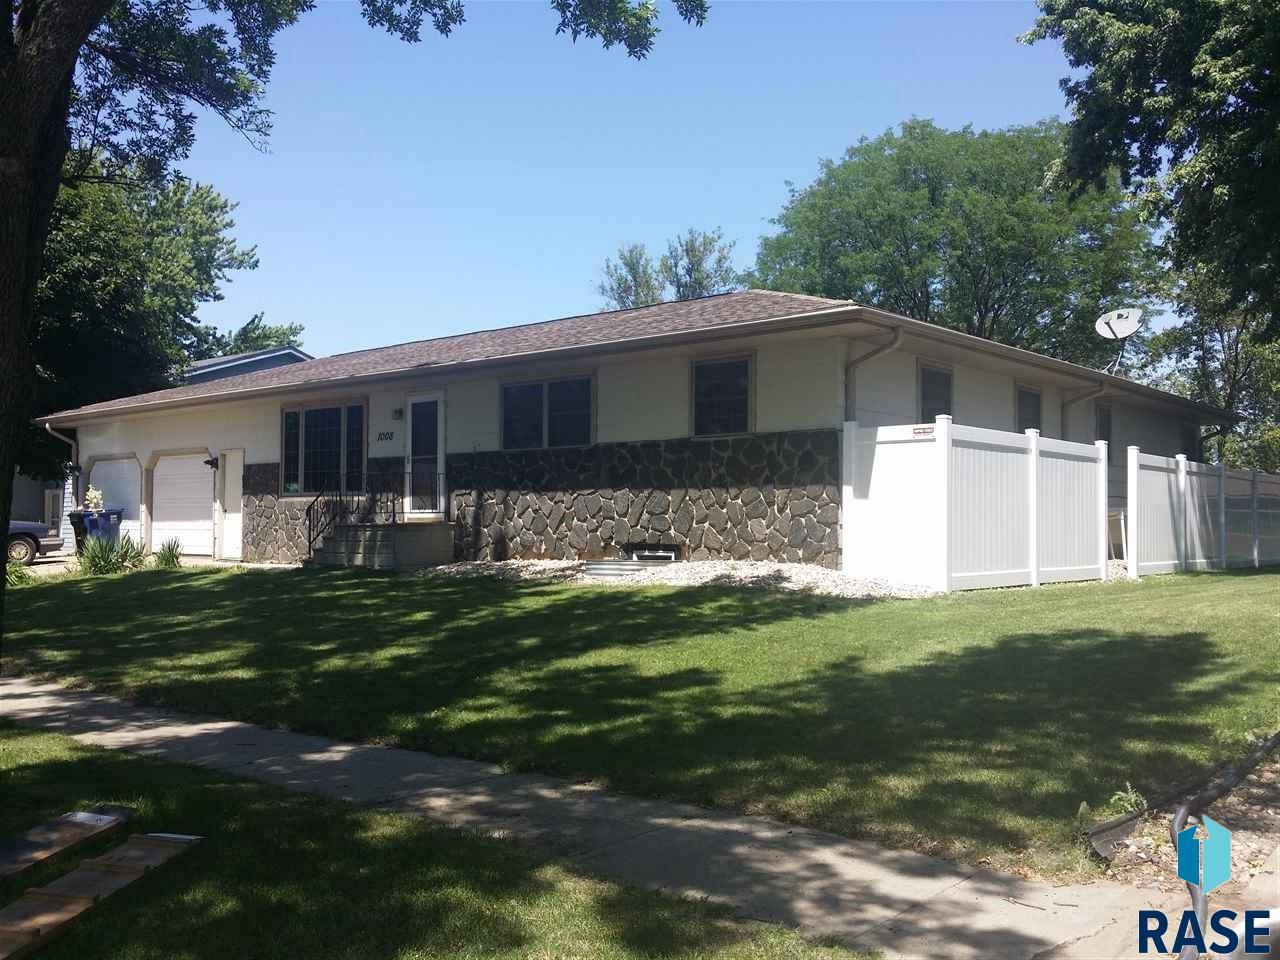 1008 W 2nd Ave, Lennox, SD 57039